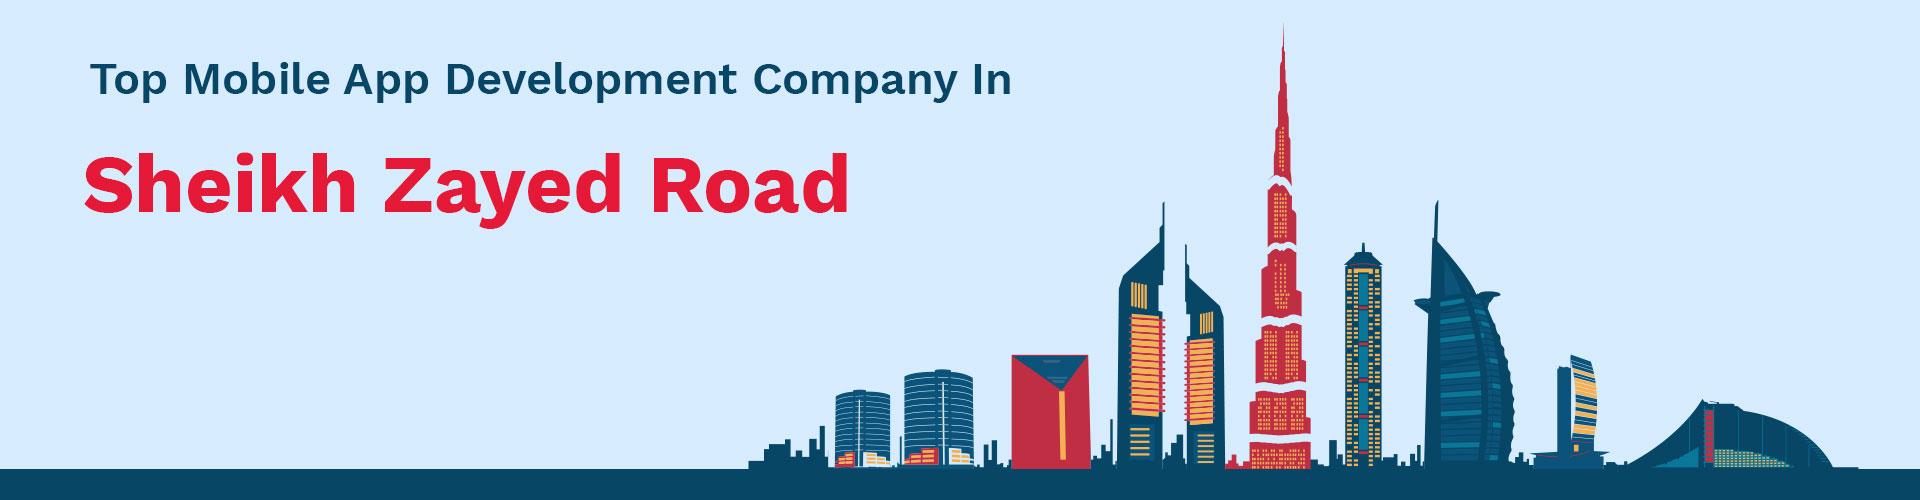 mobile app development company sheikh zayed road